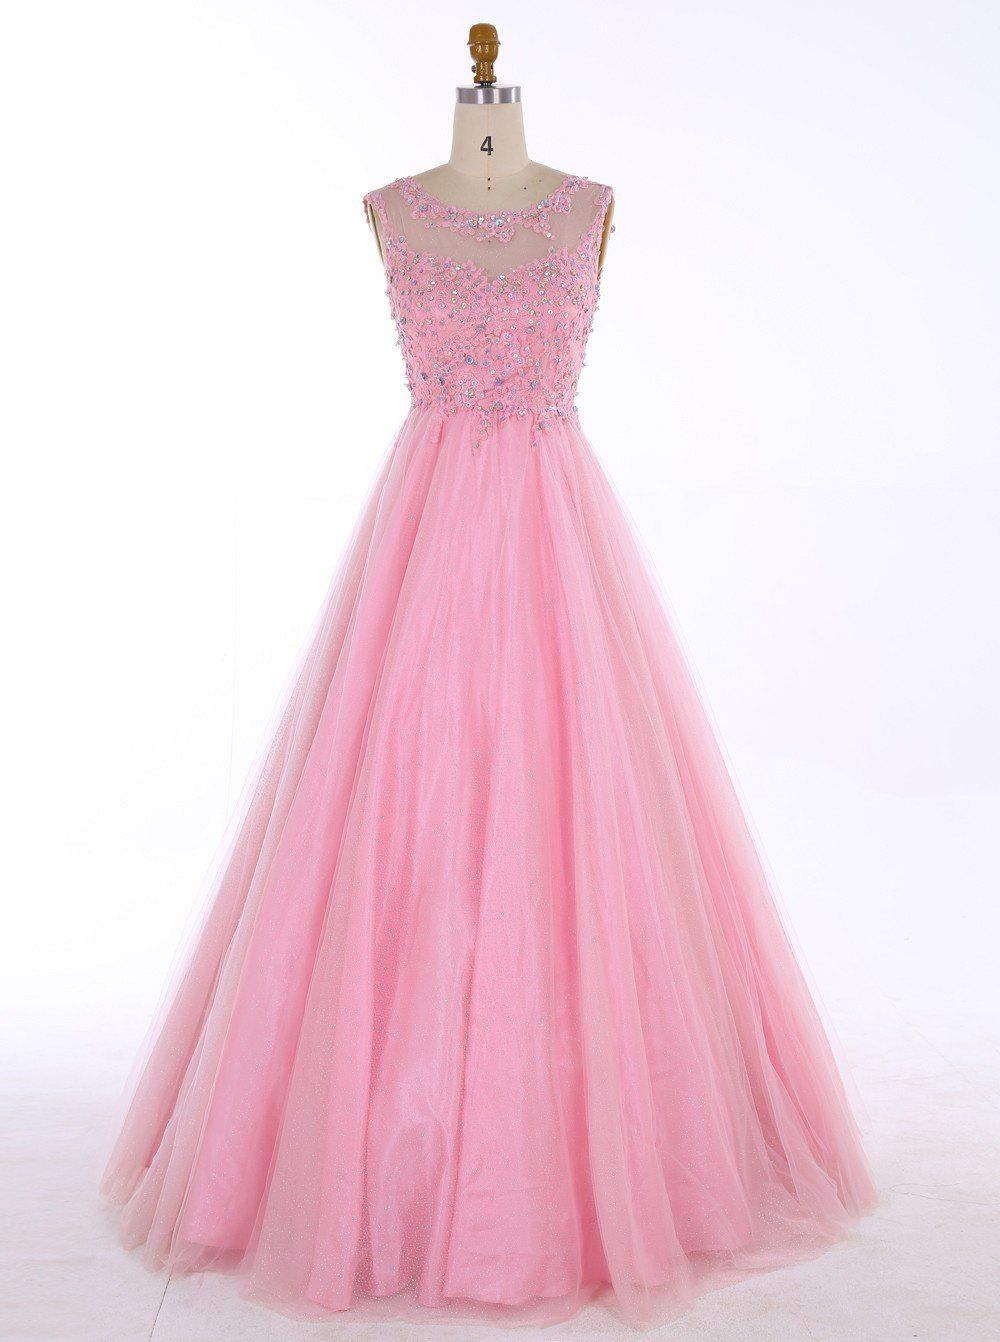 Pink prom dressescute sweet dressesprincess prom dressprom